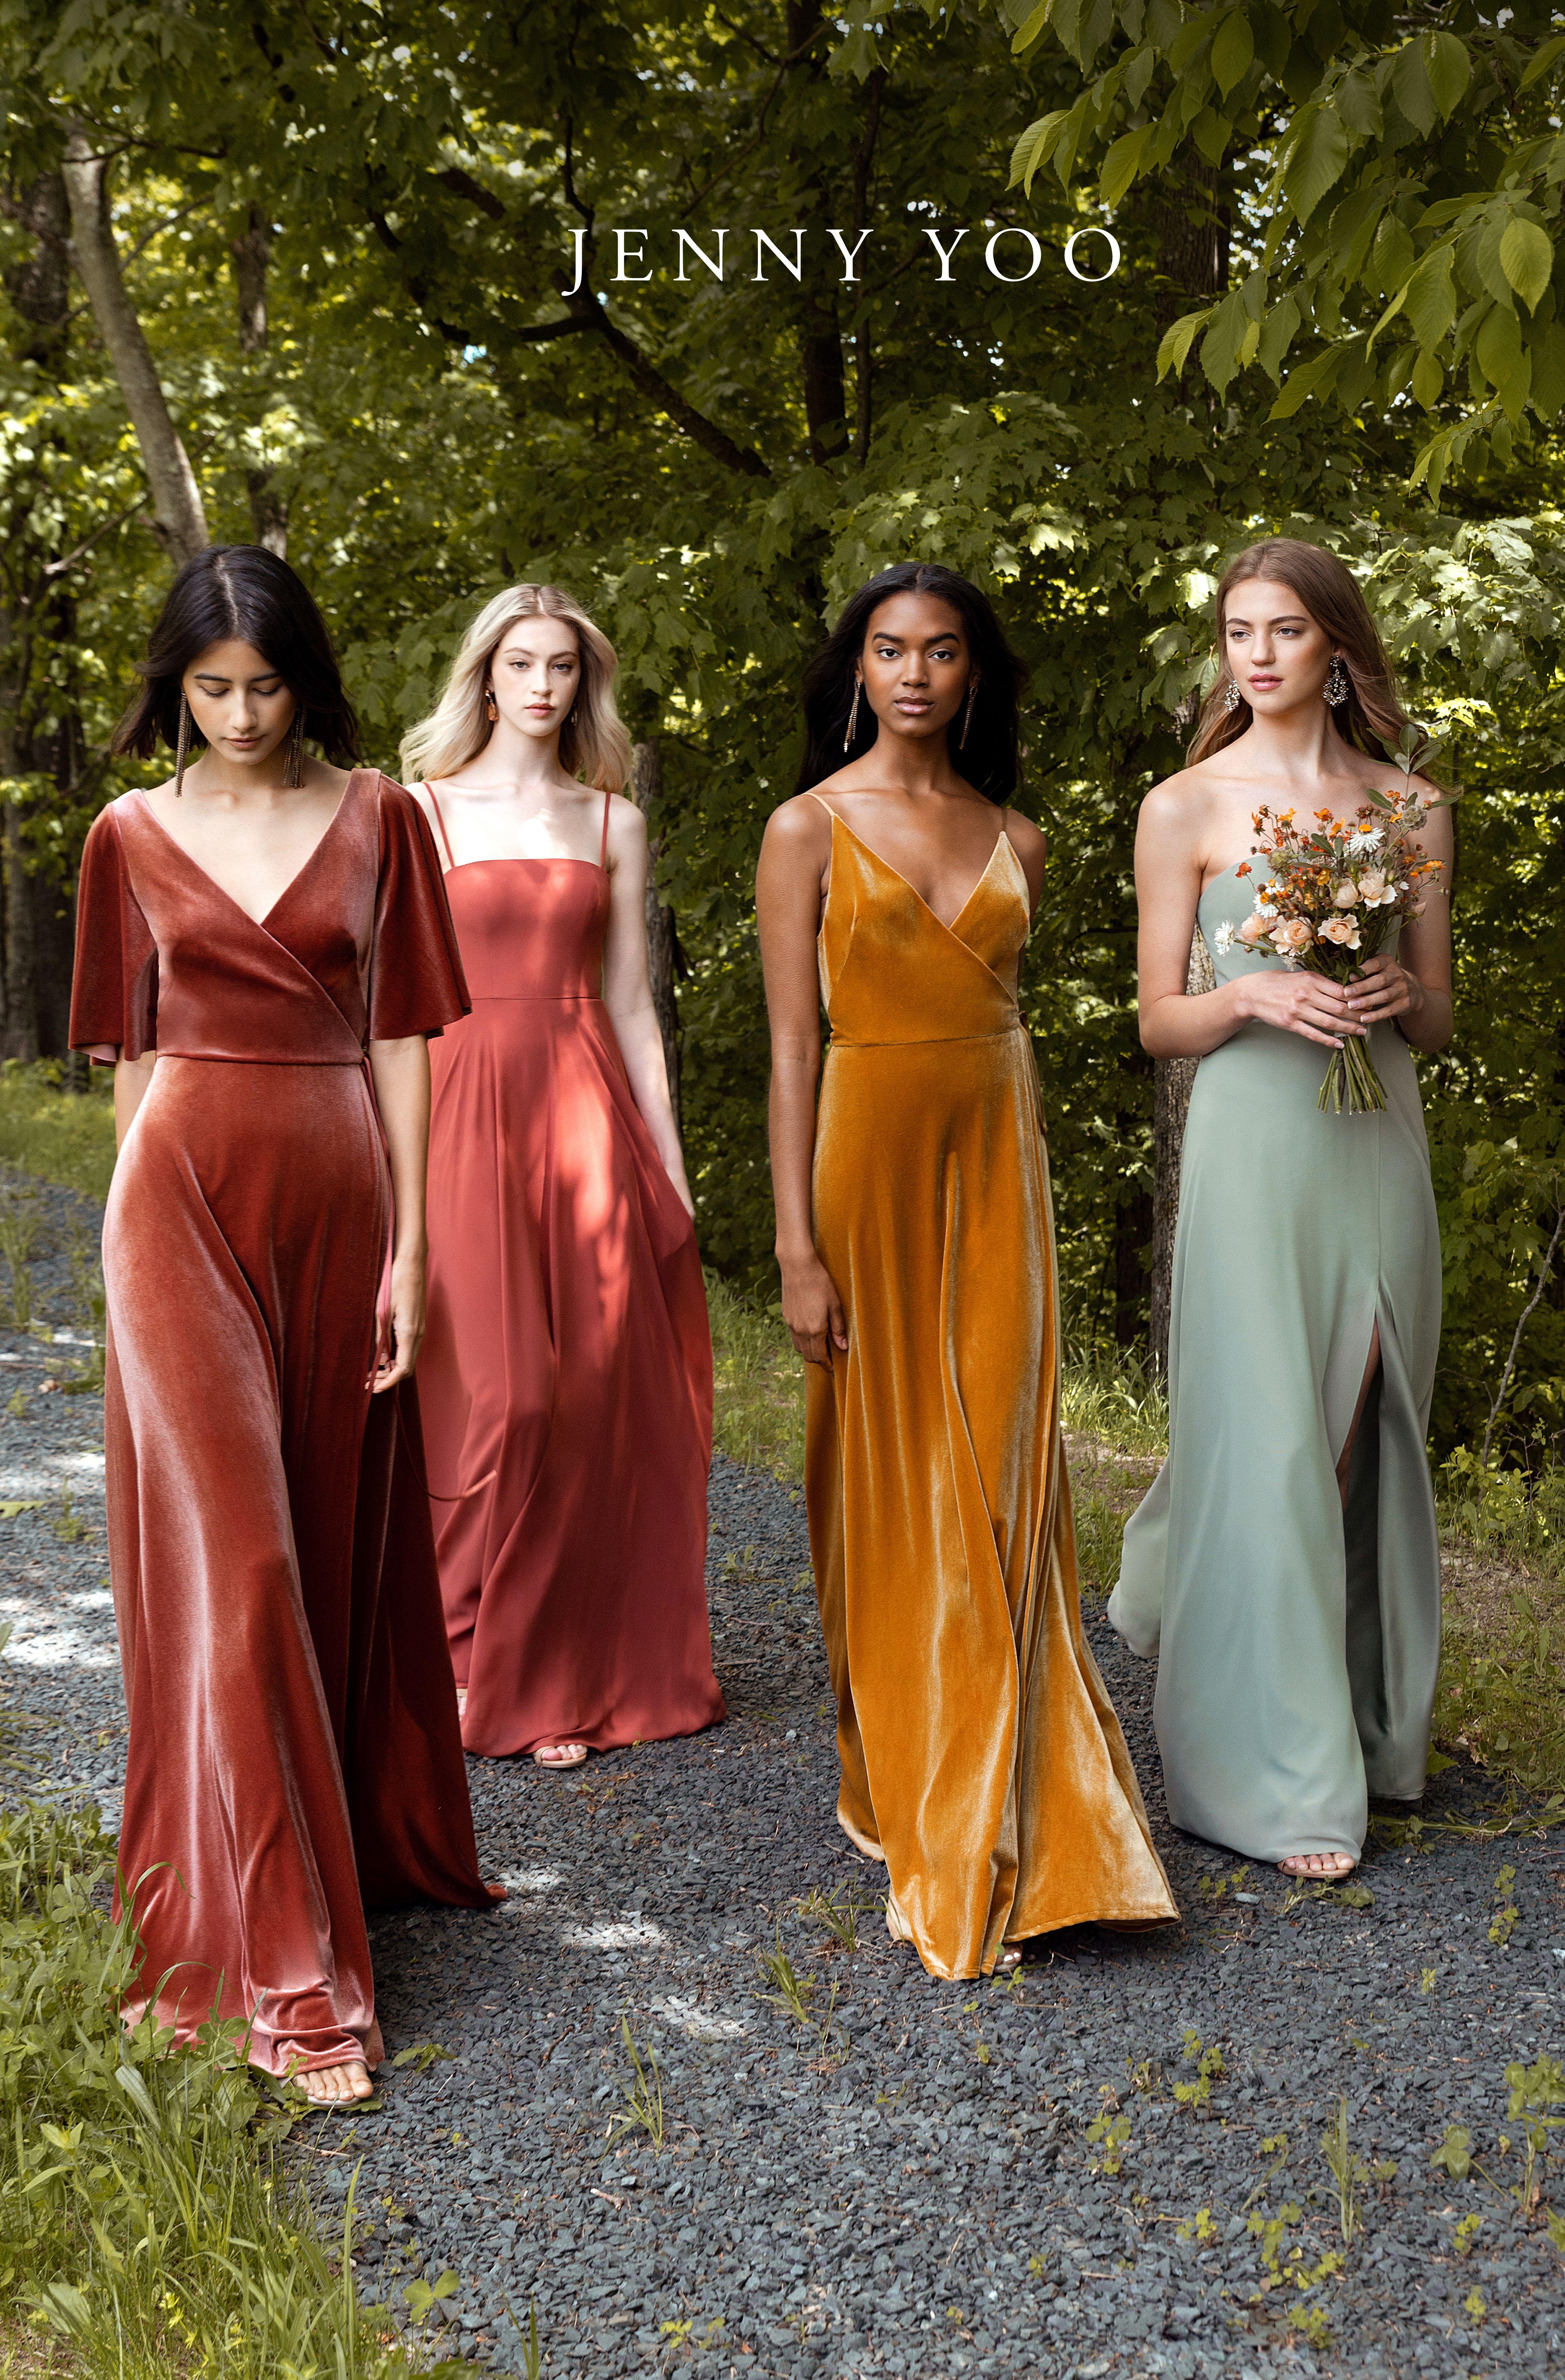 Earth Tone Fall Bridesmaids Dresses Chic Bridesmaid Dresses Bridesmaid Dress Colors Fall Bridesmaid Dresses